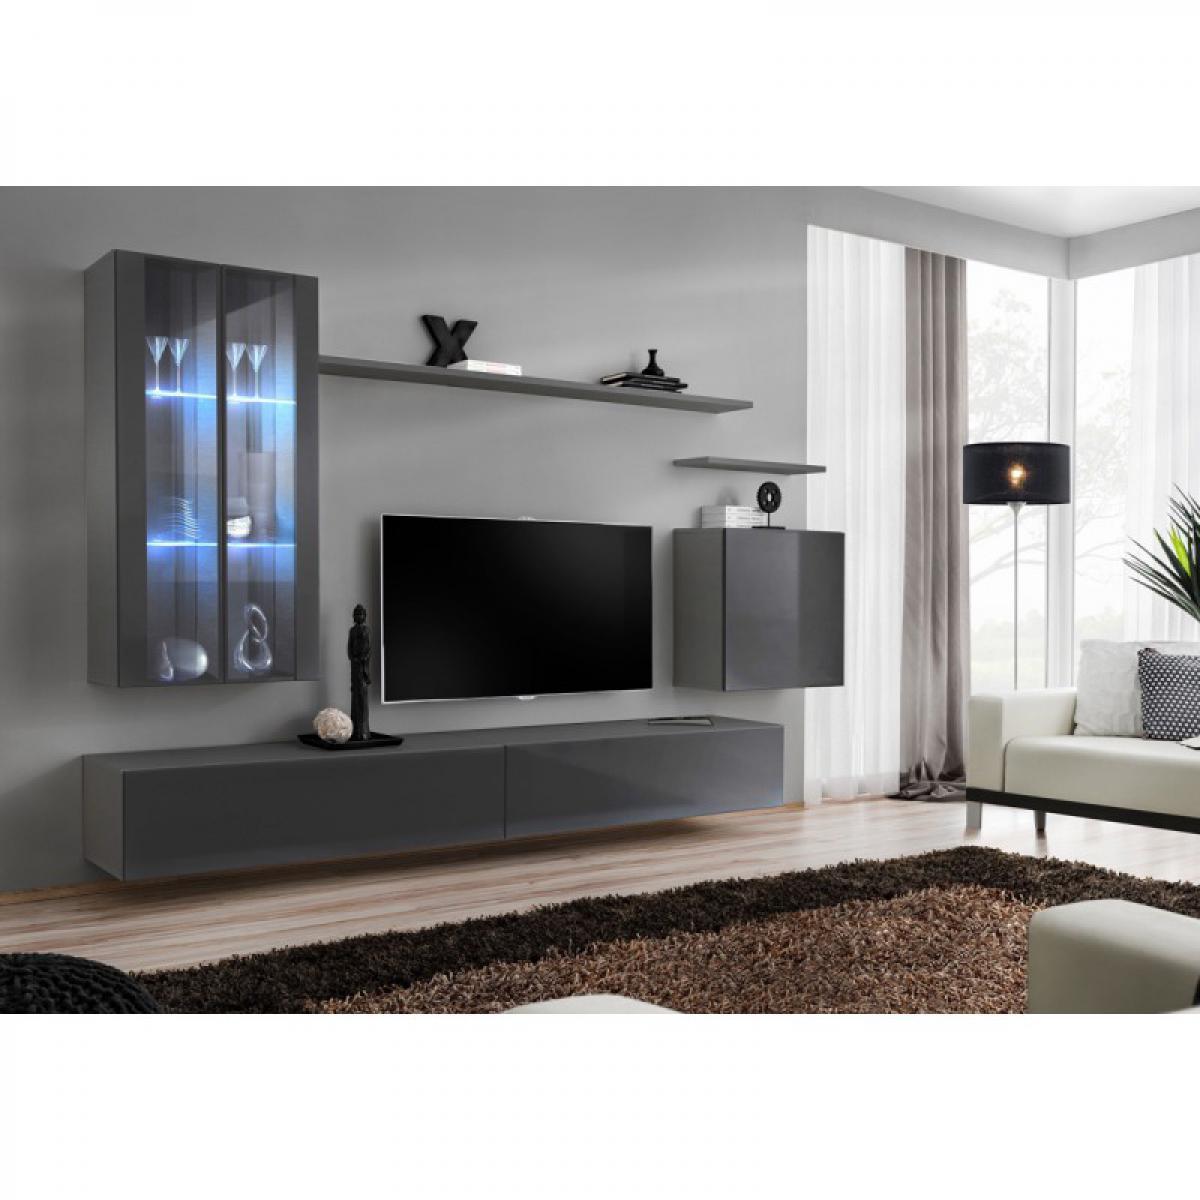 Ac-Deco Meuble TV Mural Design Switch XII 270cm Gris